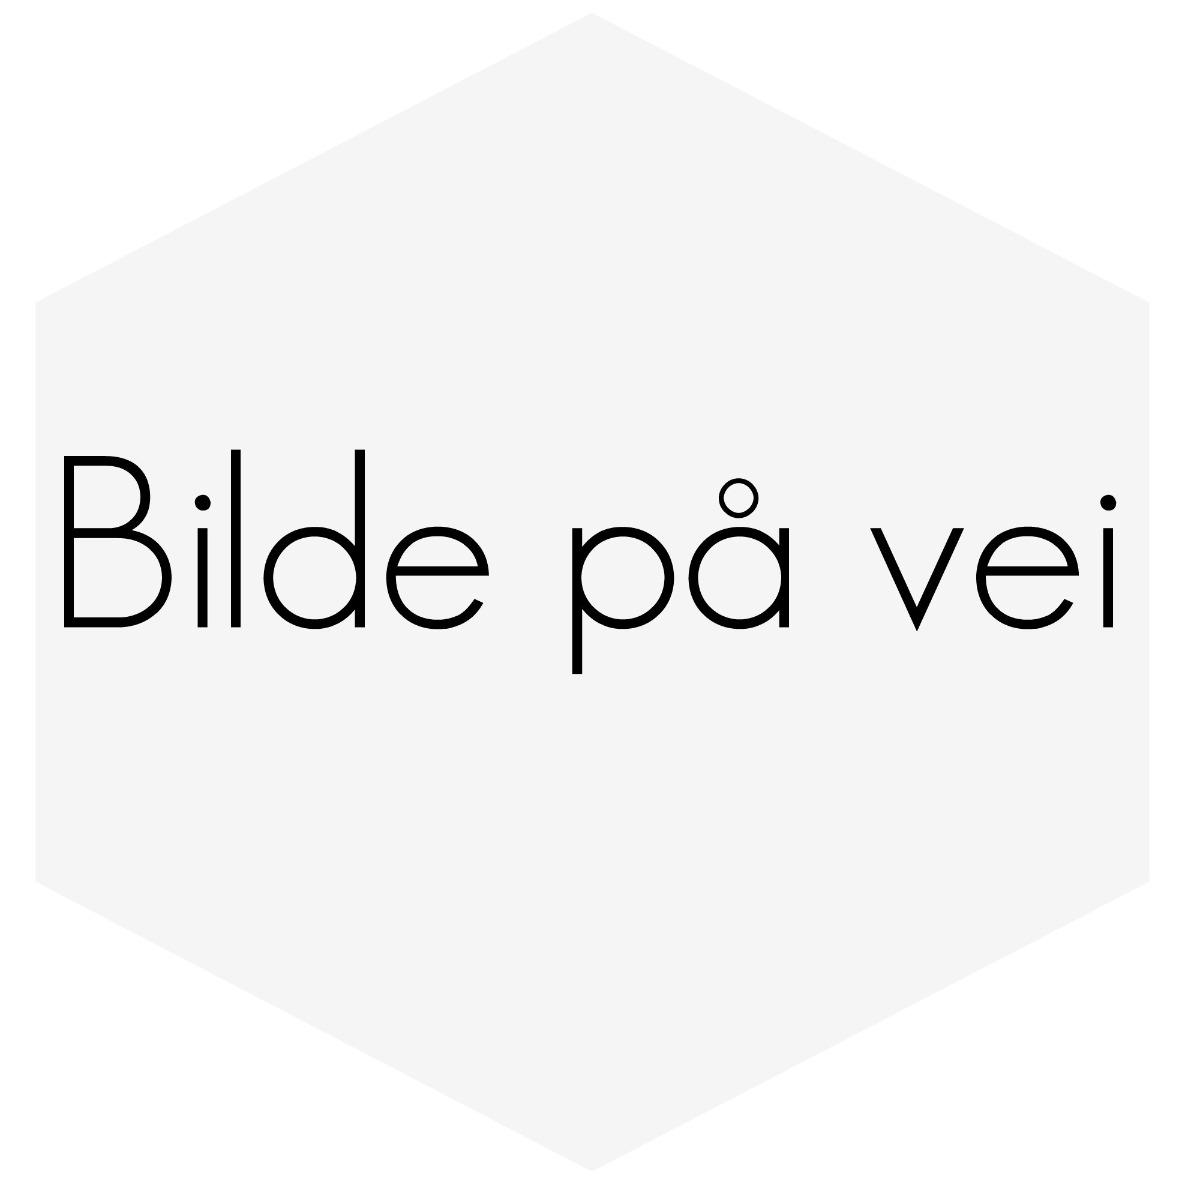 FROSTVÆSKE FORCE RØD G12 4LITERS KANNE KONSETRAT